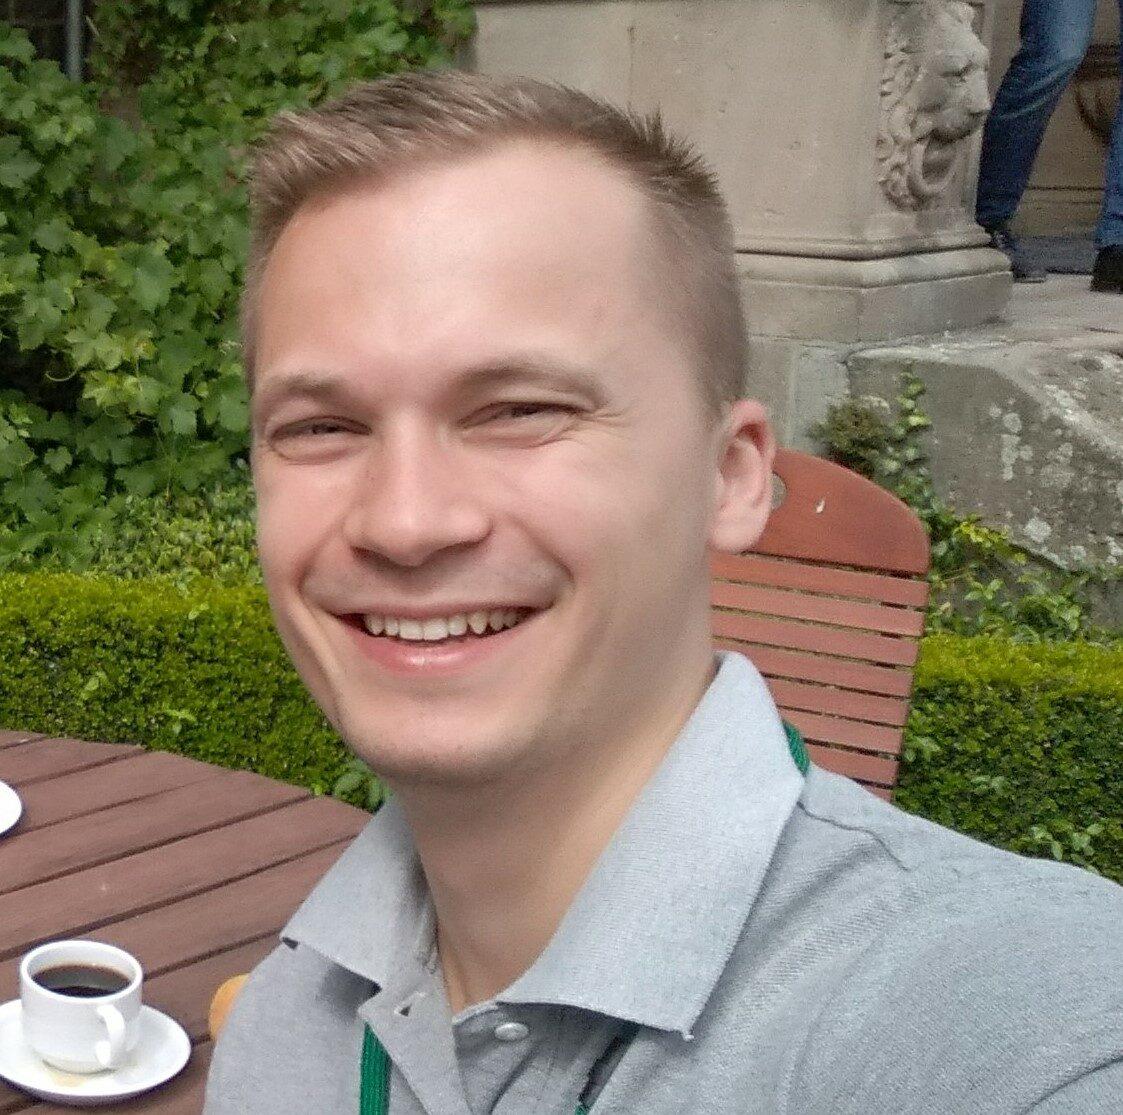 Vitalii Poberezhets - profile image